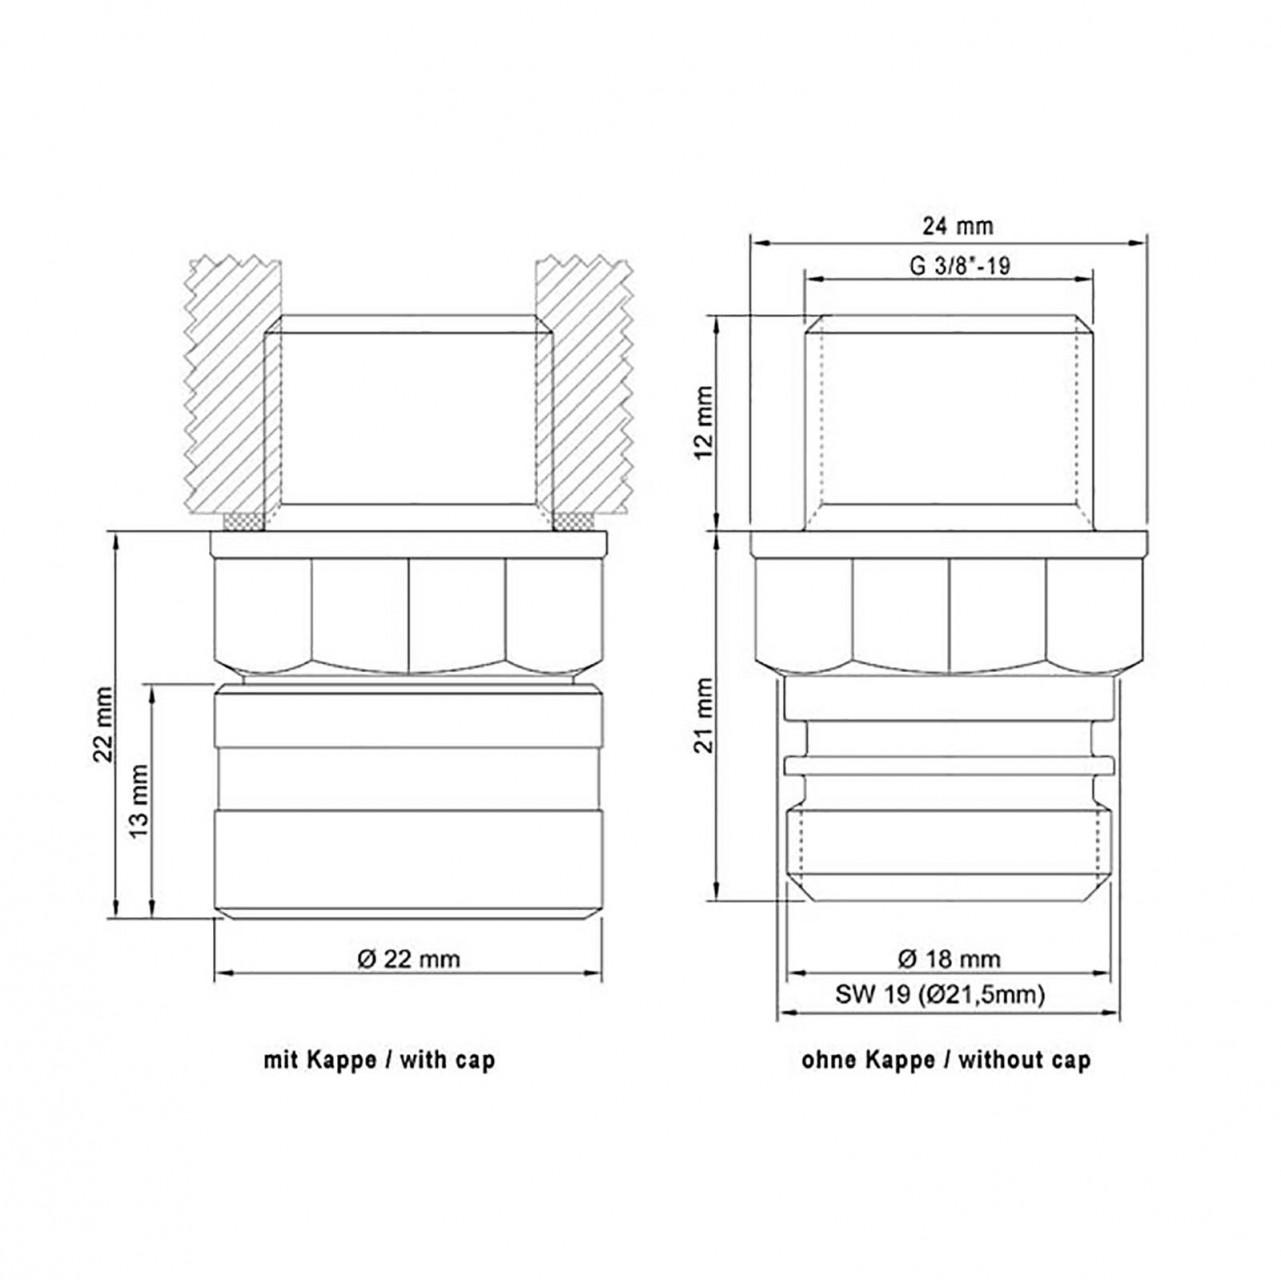 stahlbus lablassventil g 3 8 zoll 19 r 3 8 zoll 3 8. Black Bedroom Furniture Sets. Home Design Ideas